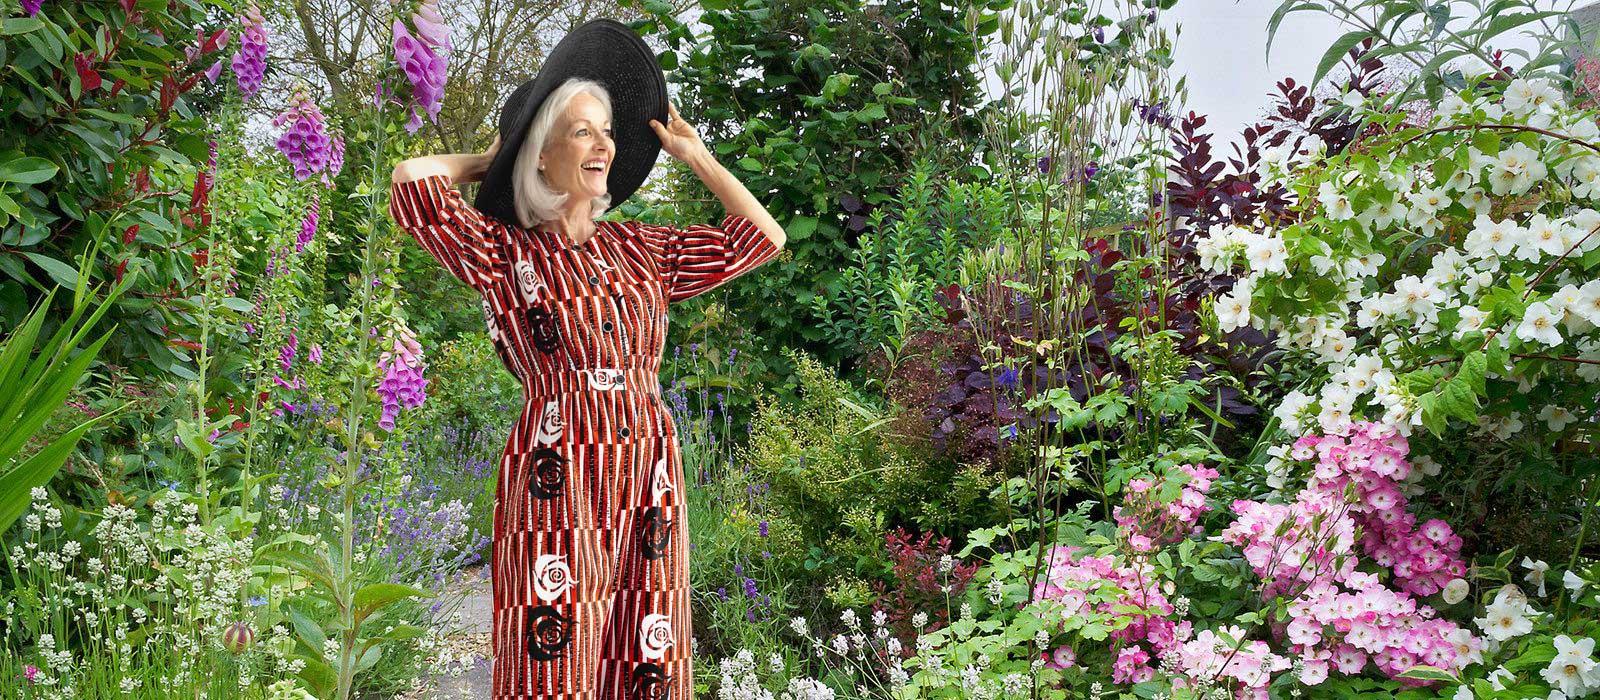 Summer Clothing by Magi Rose